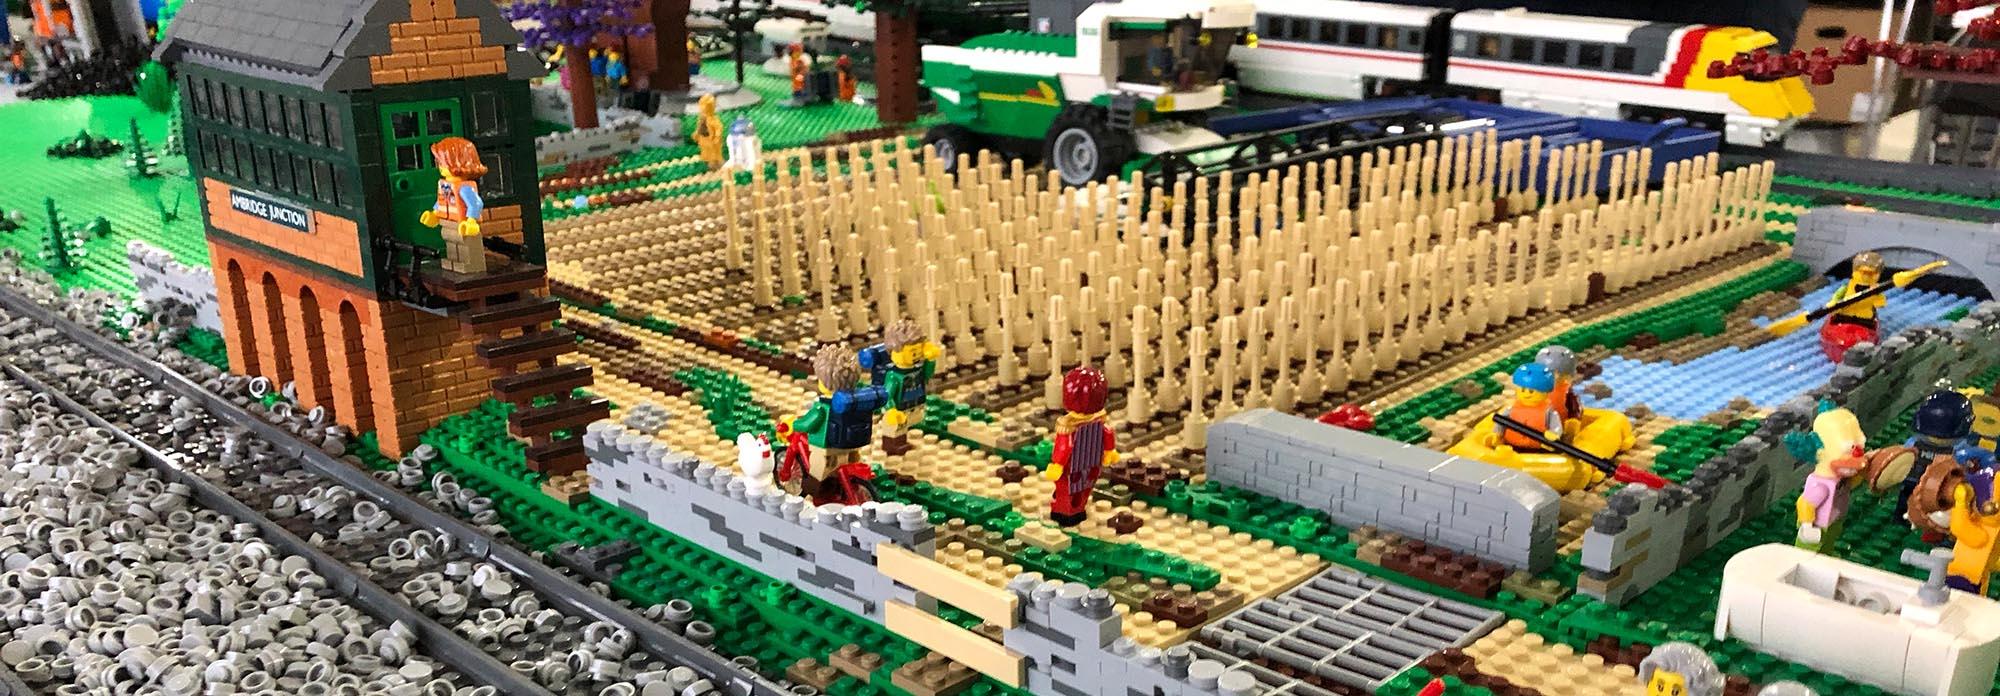 LEGO railway model landscapes